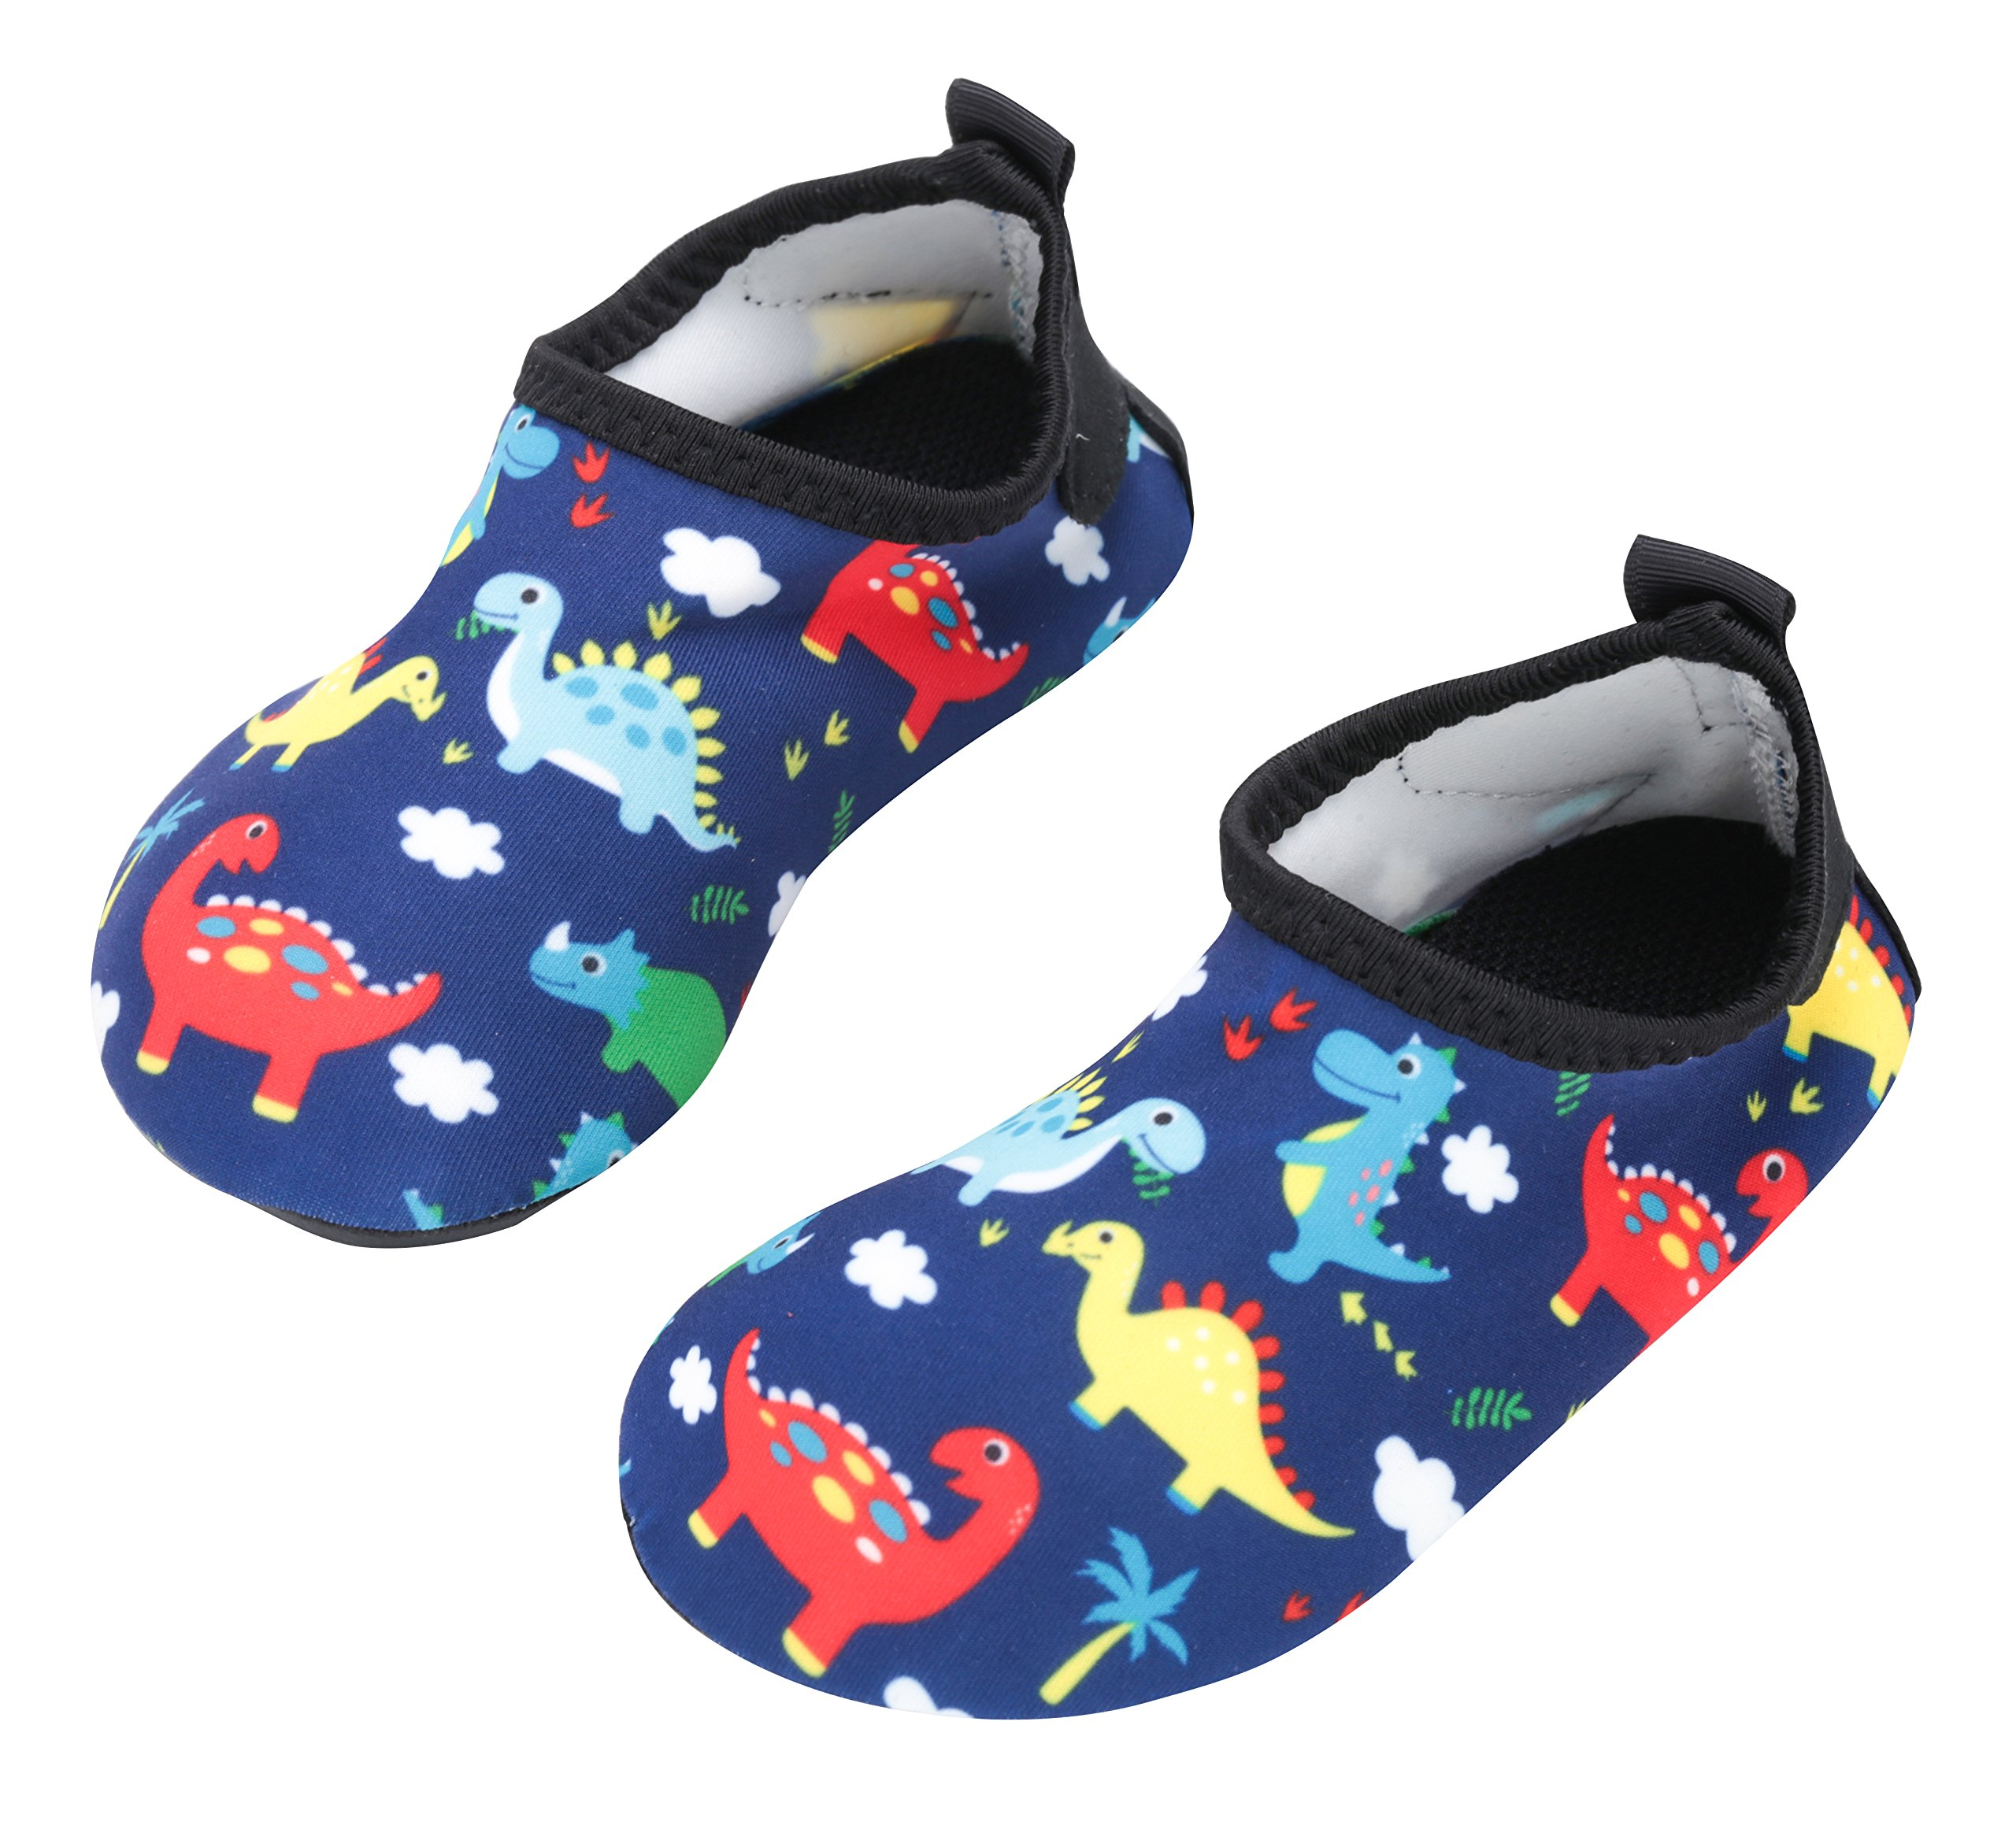 Toddler Boys Water Shoes Babys Skin Swim Shoes Child Quick Drying Barefoot Aqua Socks for Girls Pool Beach Lightweight Dinosaur Summer HDKL 24-25